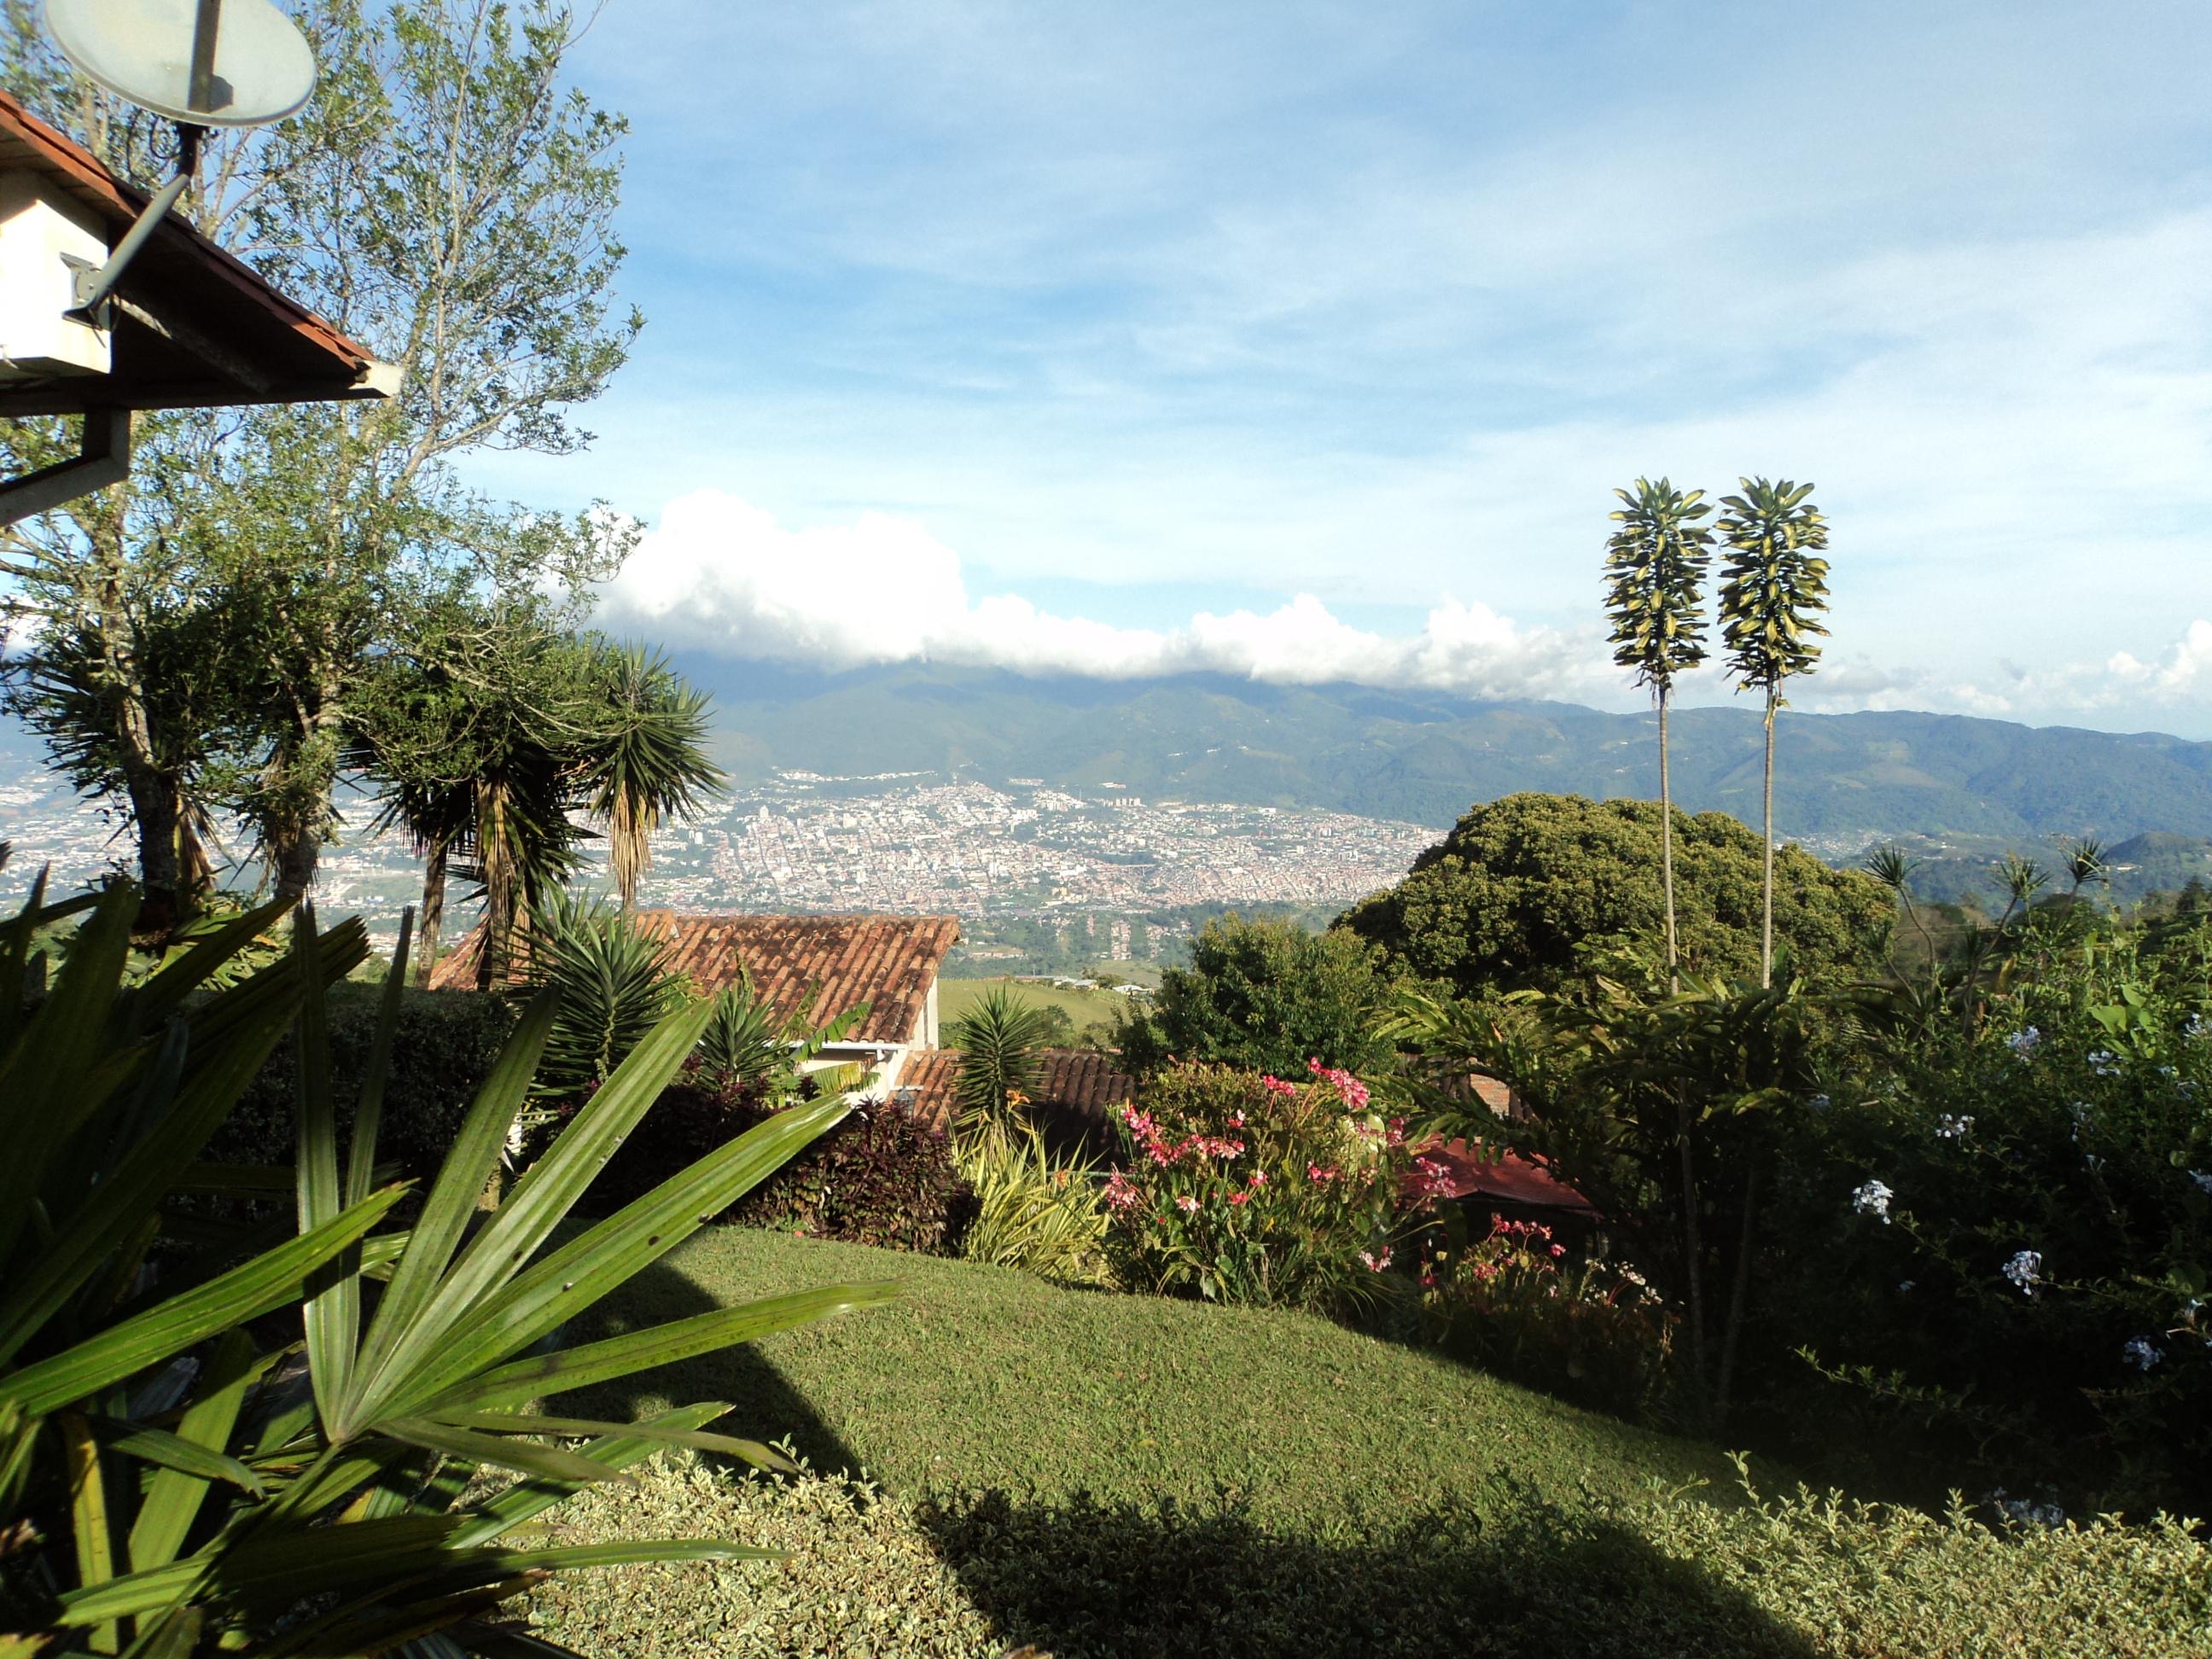 Kostenlose Foto Venezuela Anden Berge Vegetation Pflanze